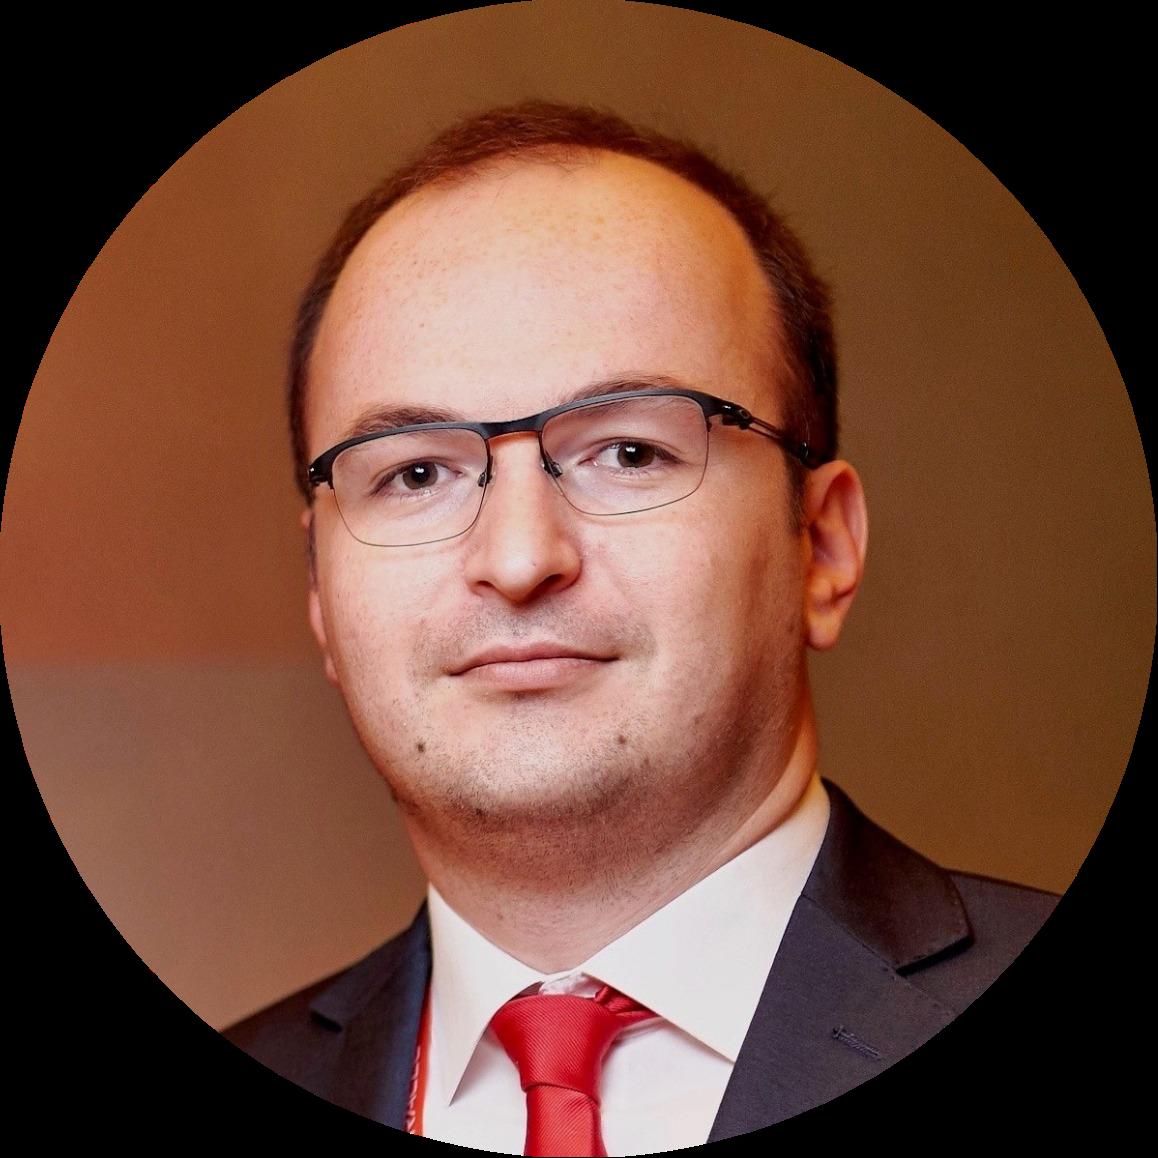 Alexandru_Barbaneagra